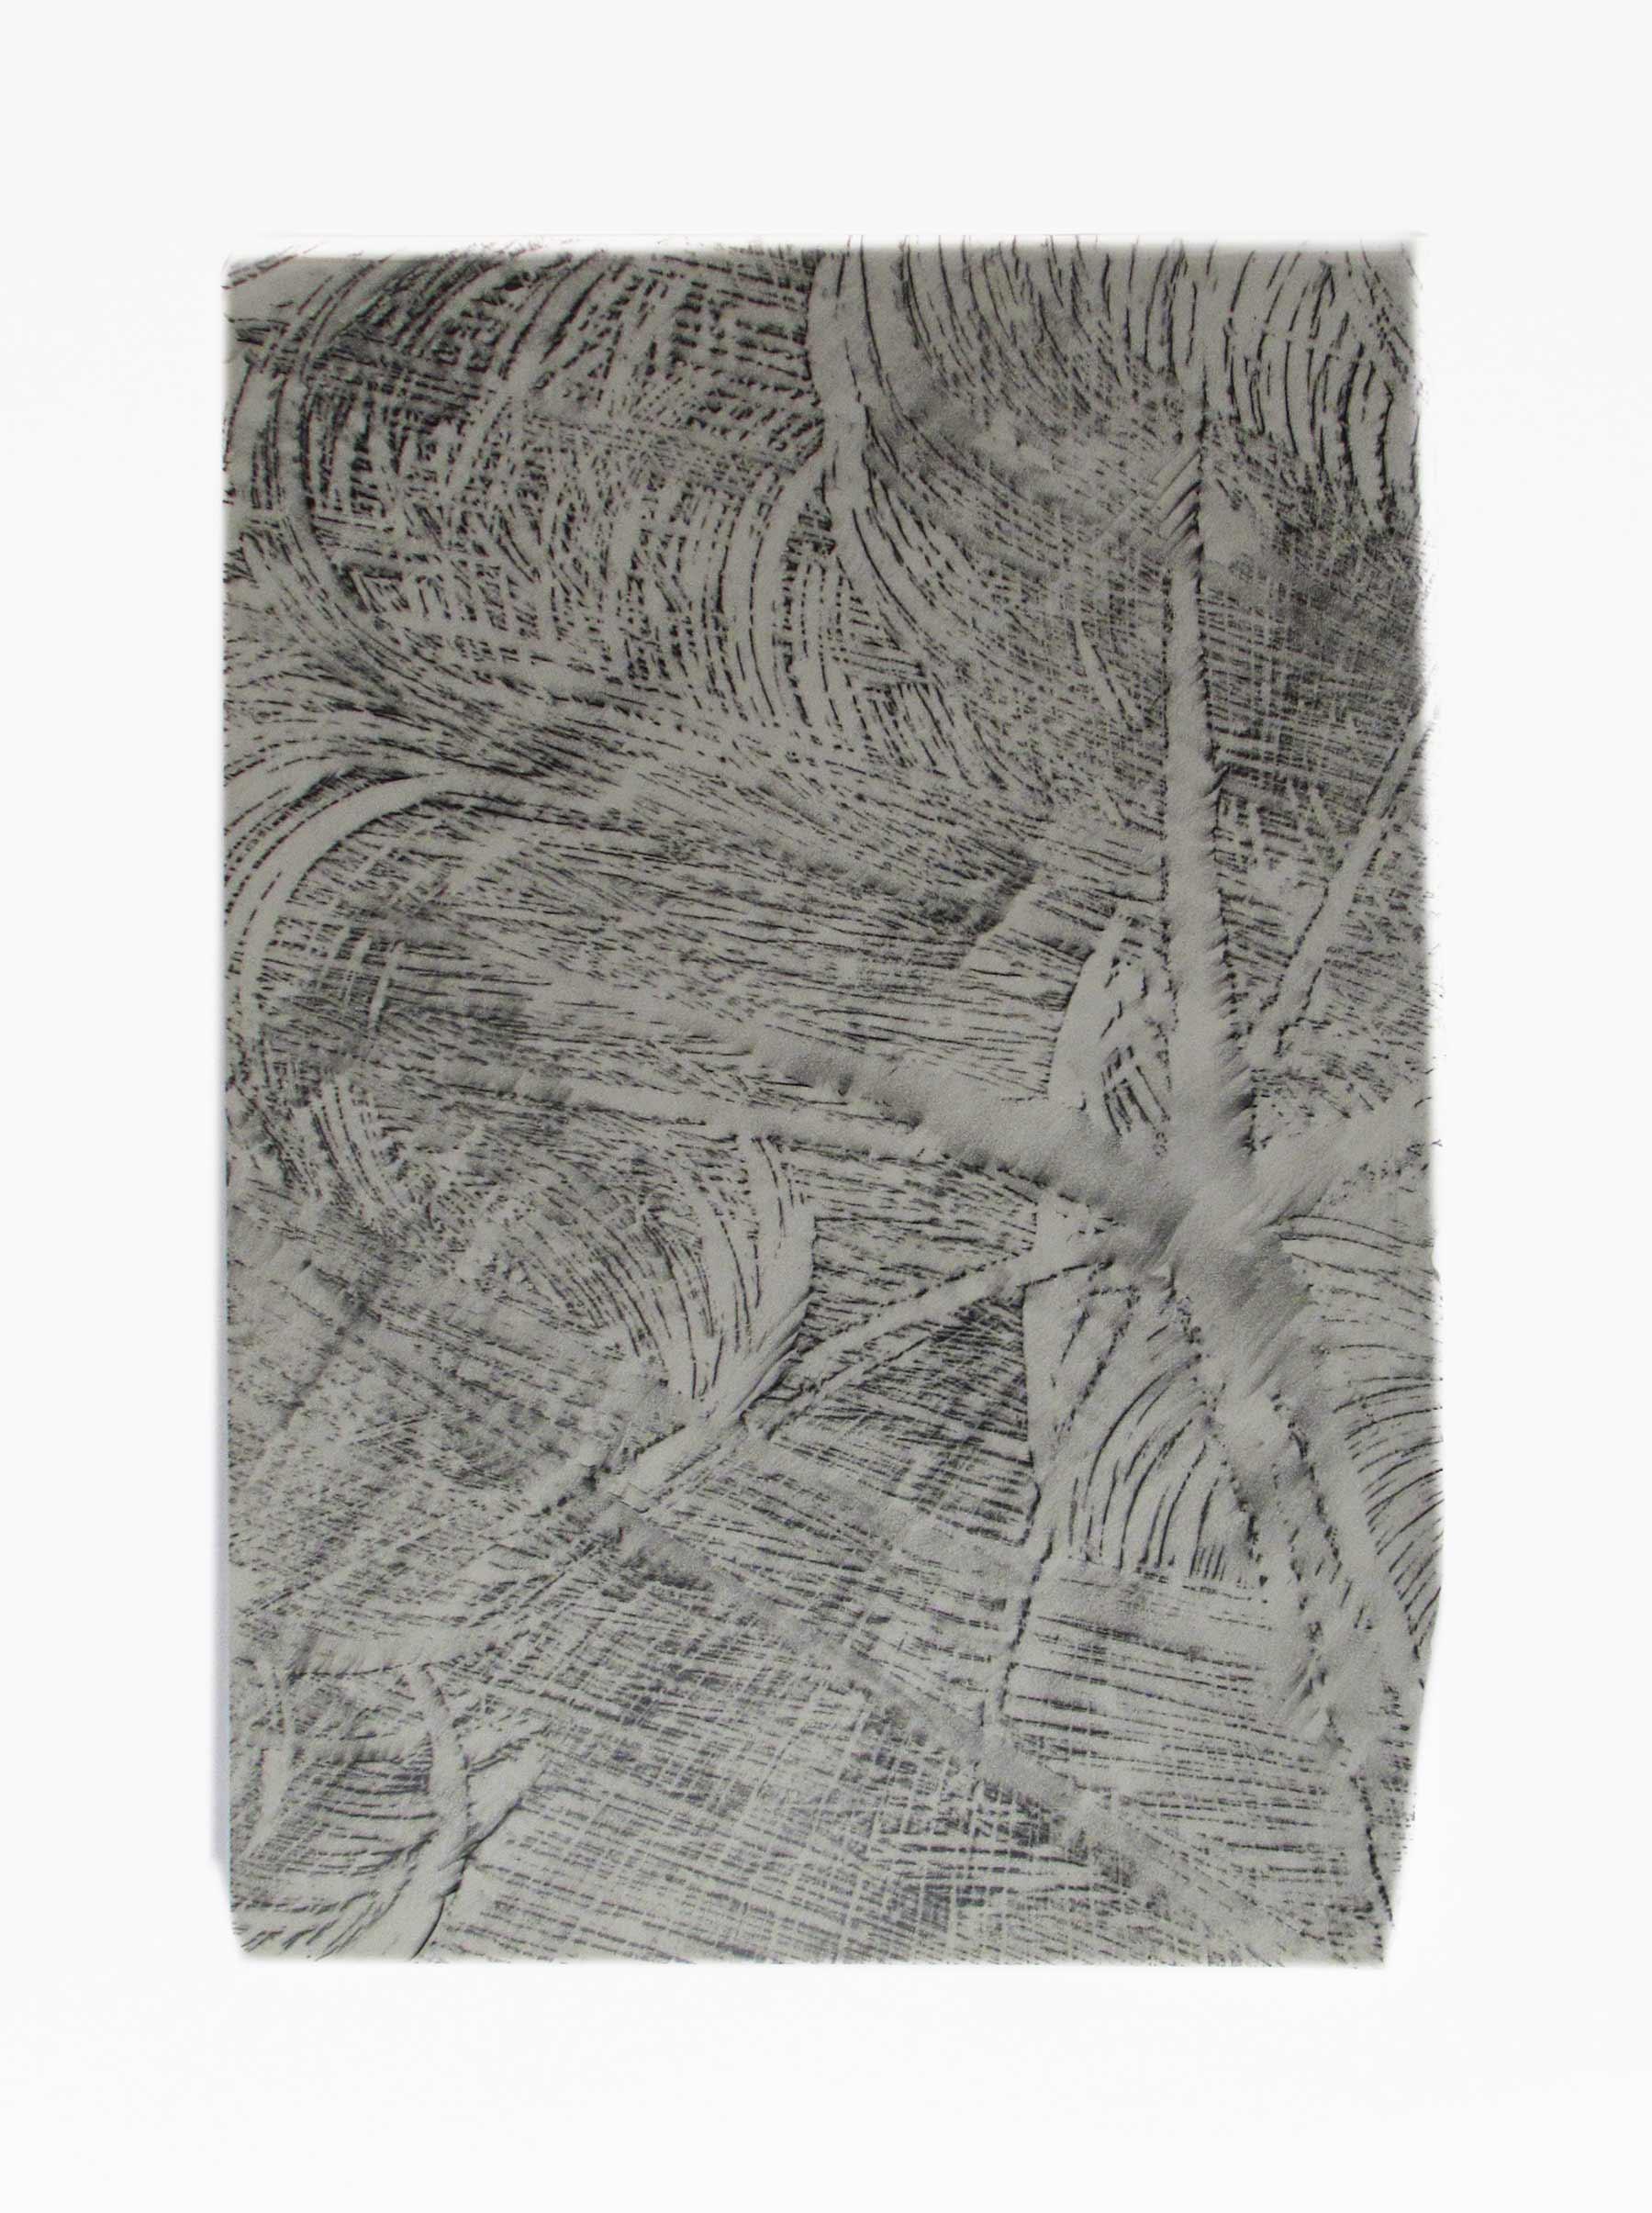 nicolapedana-Troisi-ricordo--2018-grafite-su-carta--20,5x29,7-cm